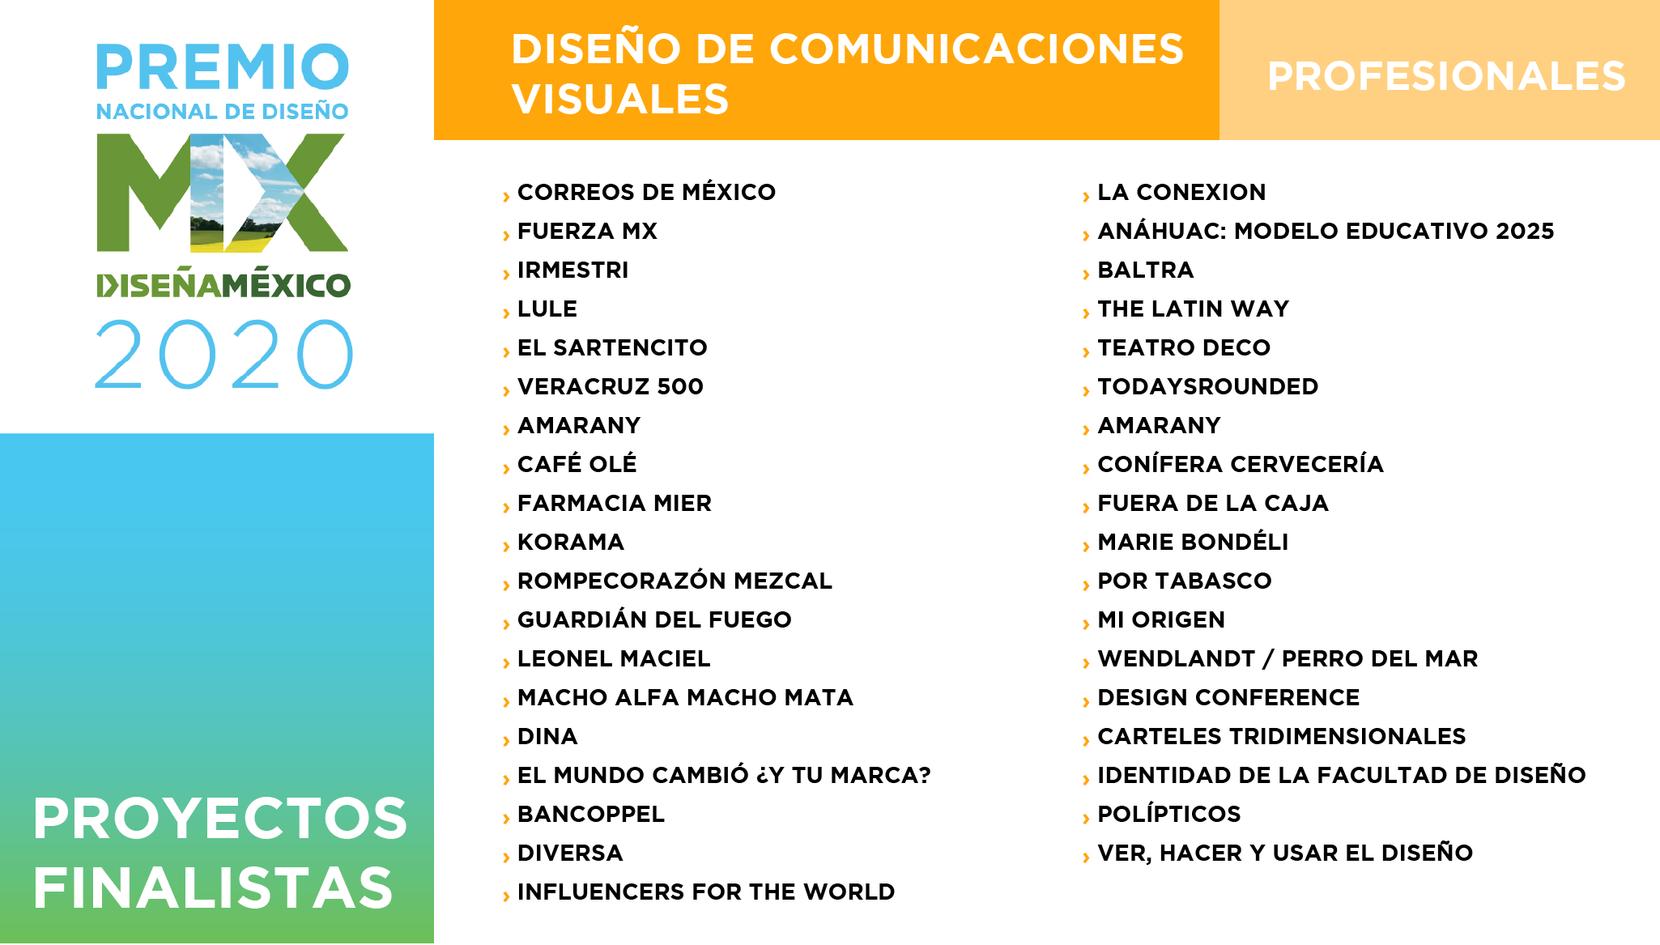 COMUNICACIONES VISUALES / PROFESIONALES